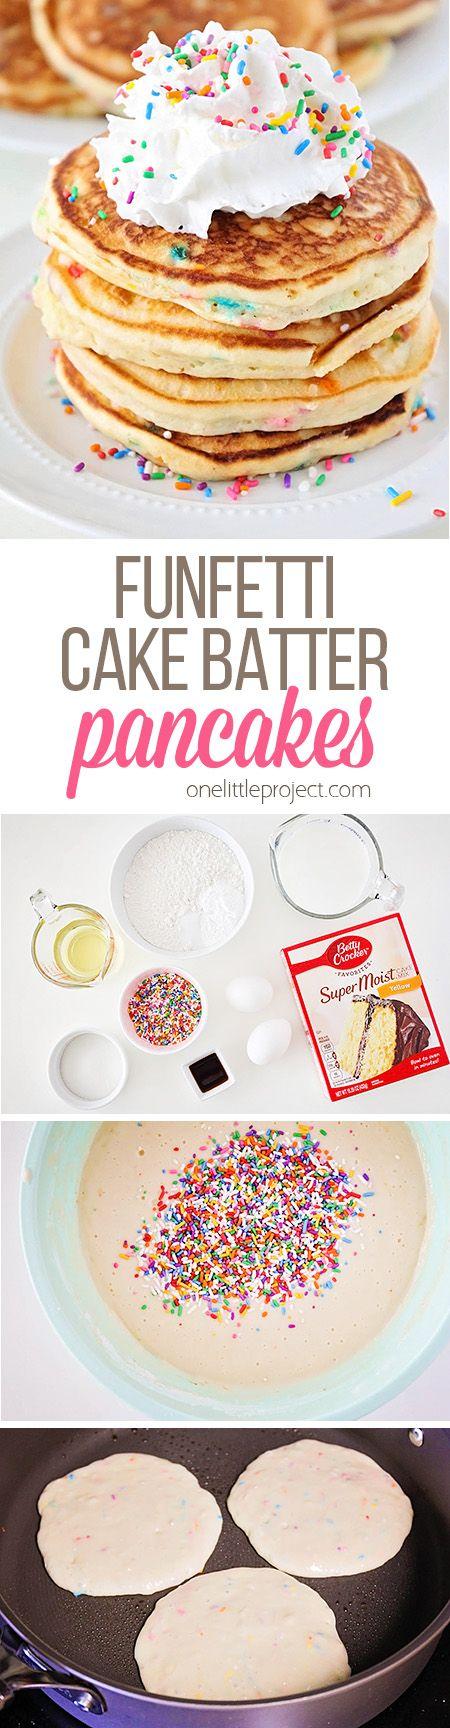 25 best ideas about Birthday Cake Pancakes on Pinterest